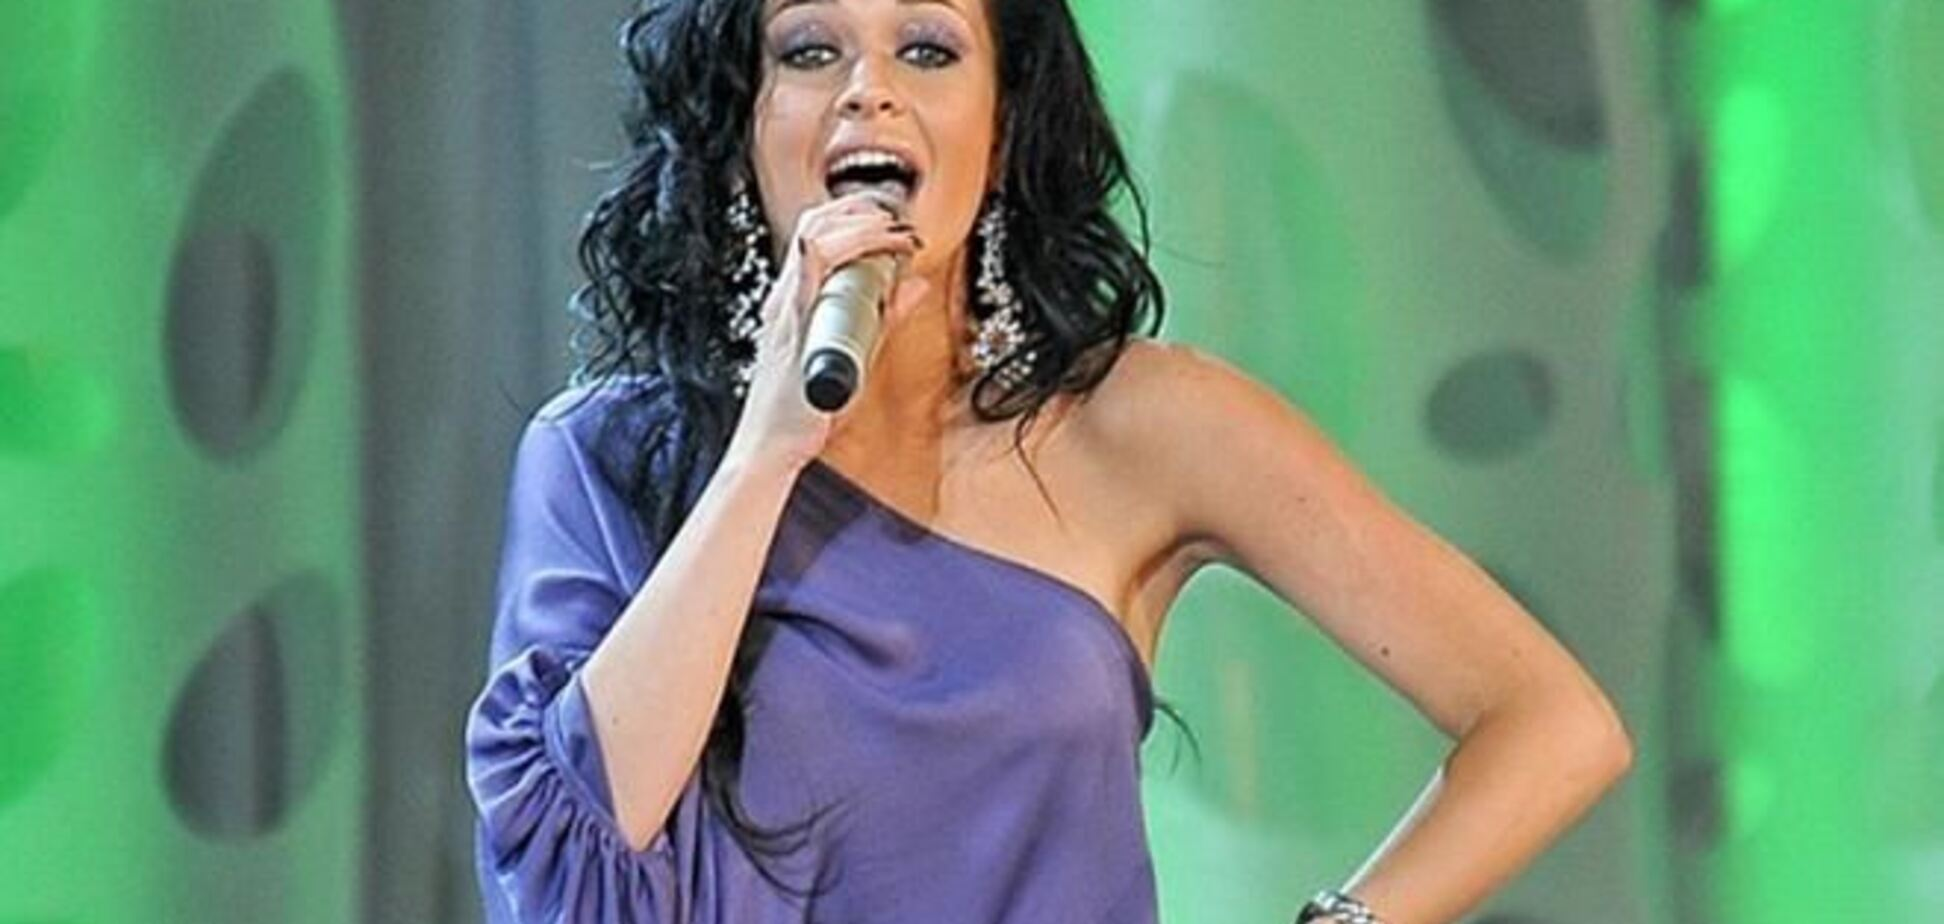 Яремчук до 'Євробачення' готує хореограф Мадонни